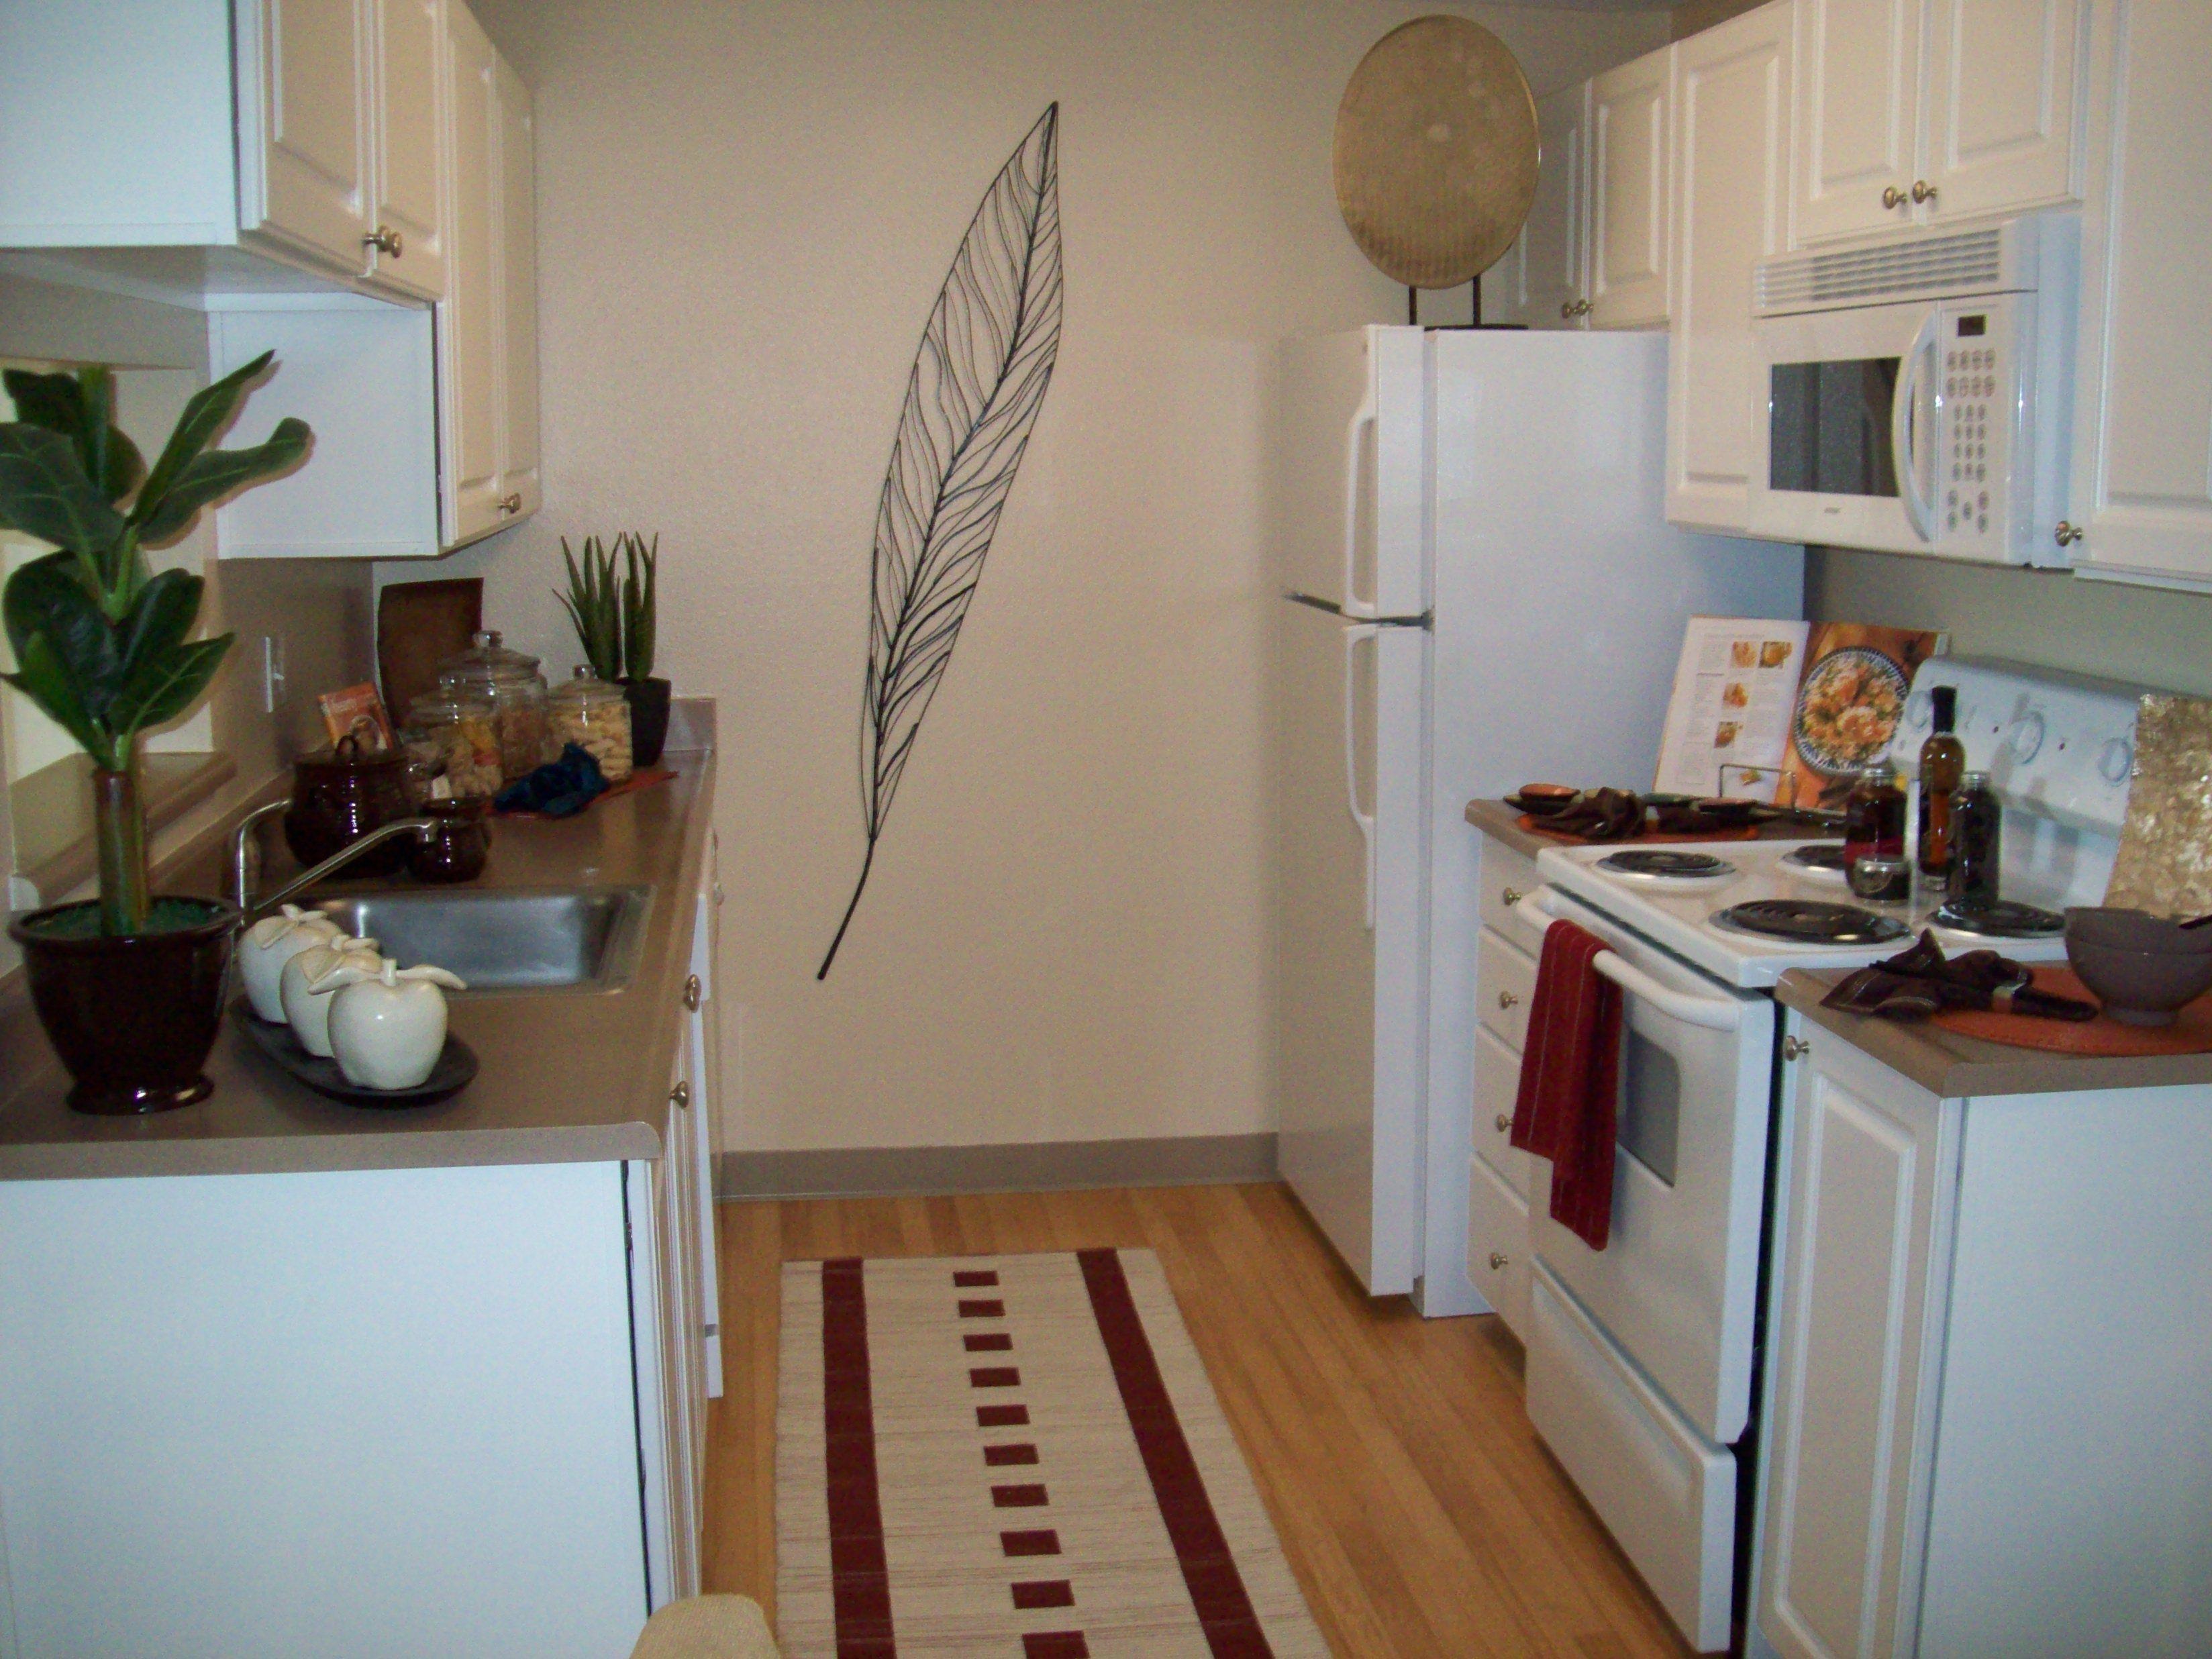 Cascade Onebedroom, One Bath 644 sq. feet Kitchen